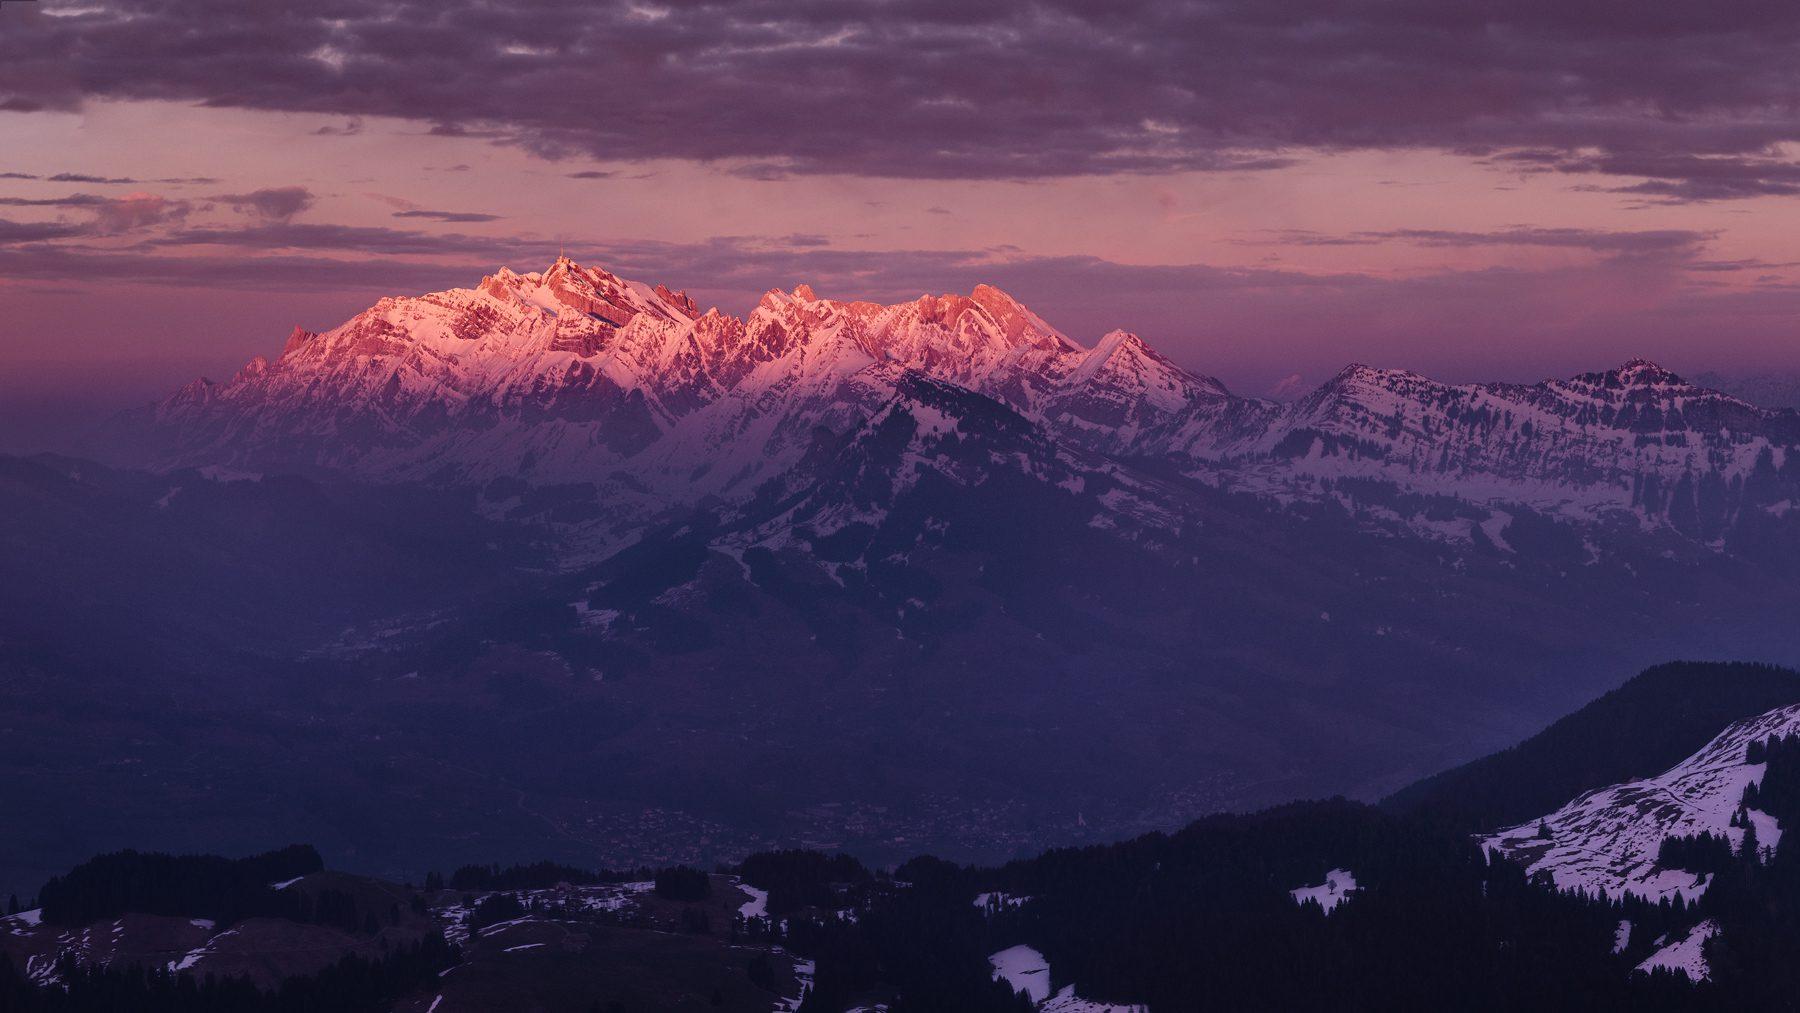 Säntis - Sonnenuntergang - Luftaufnahme © by Gerry Pacher Photography